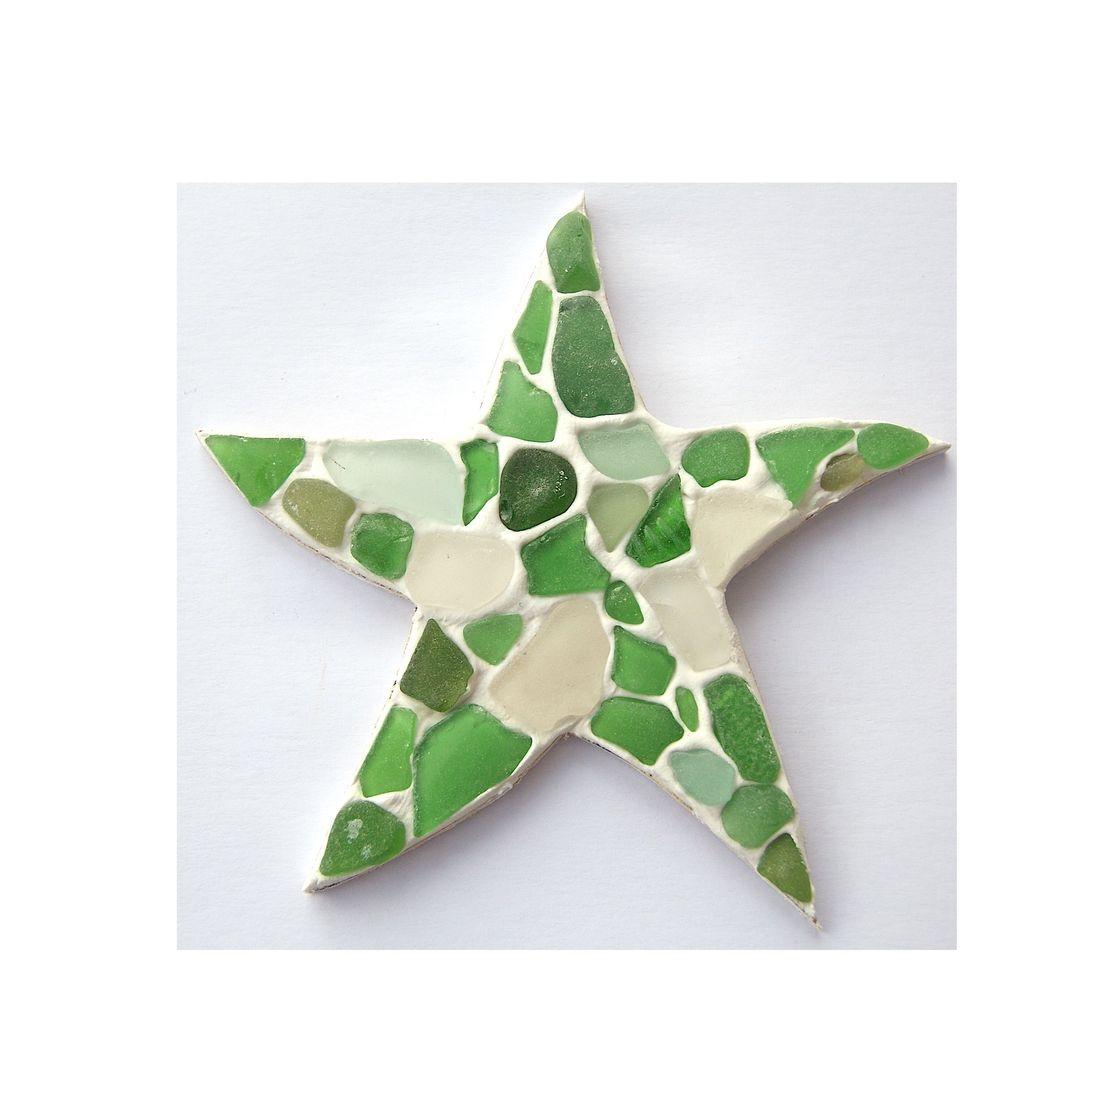 Fridge magnet seaglass starfish